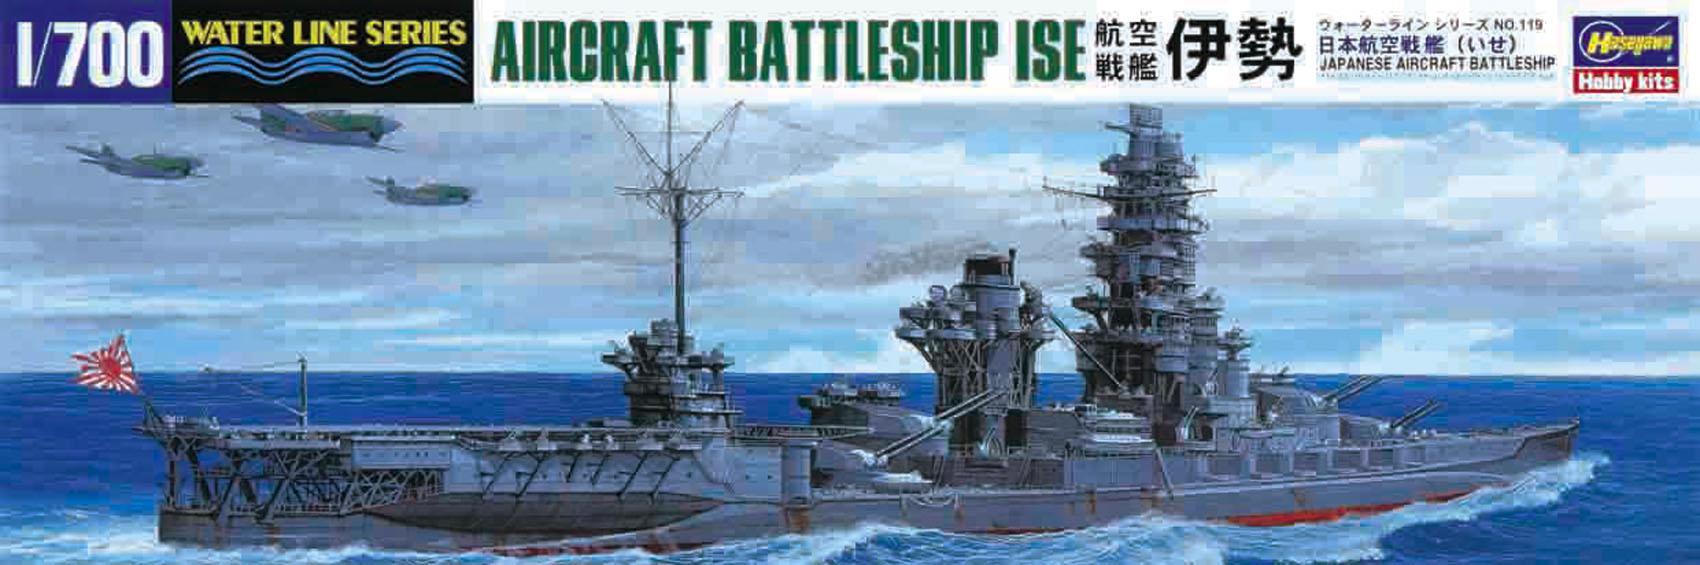 Hasegawa Ijn Aircraft Battleship Ise